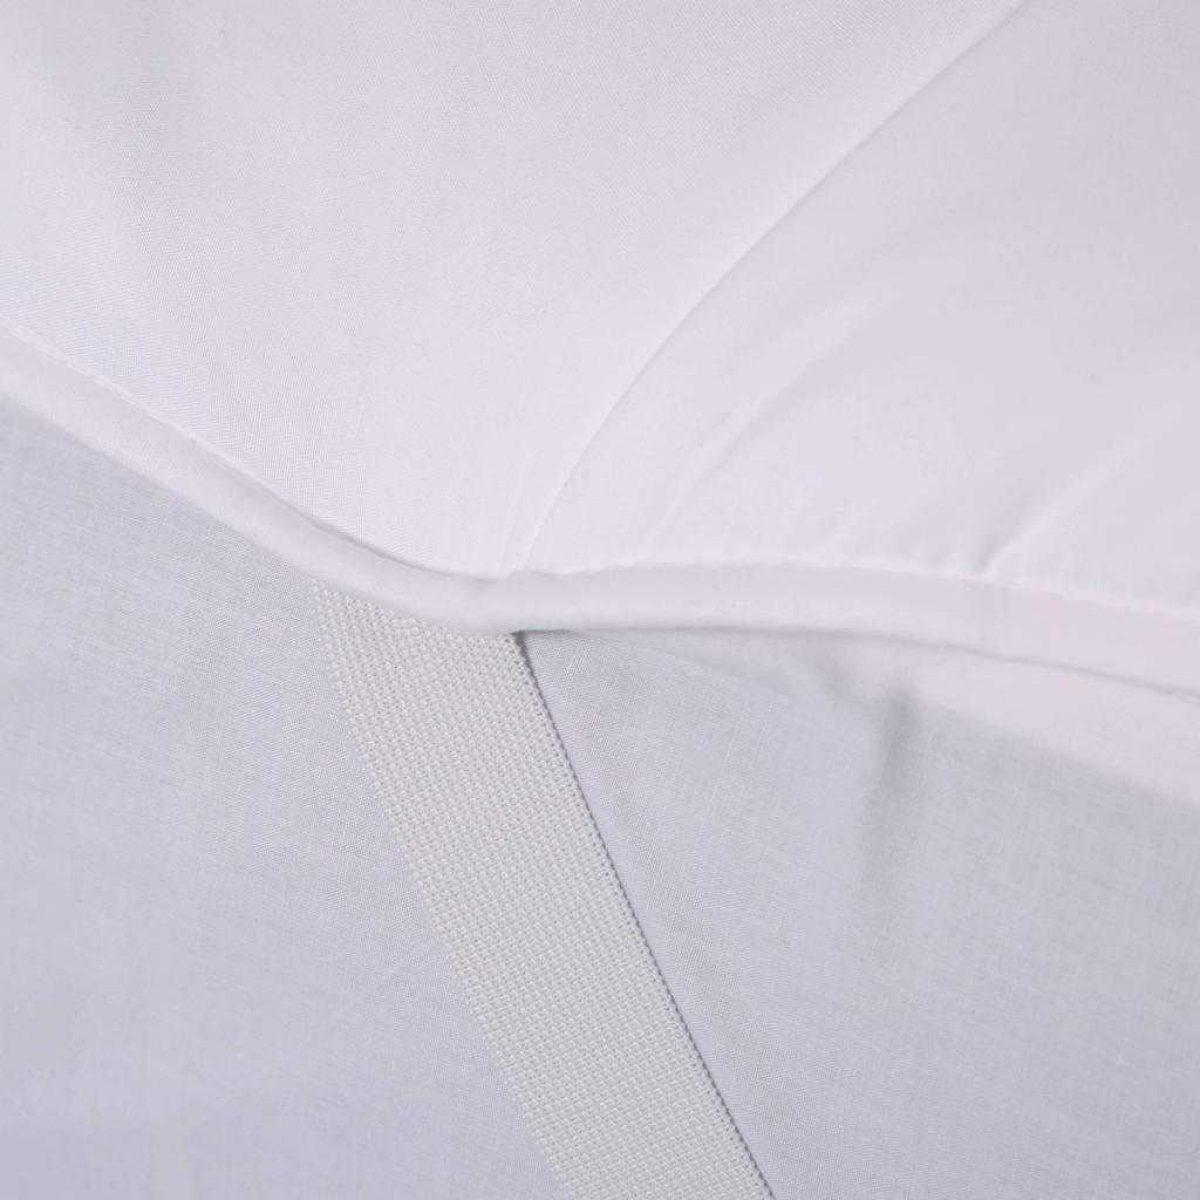 Fine Bedding Spundown Mattress Enhancer Detail 1024x1024